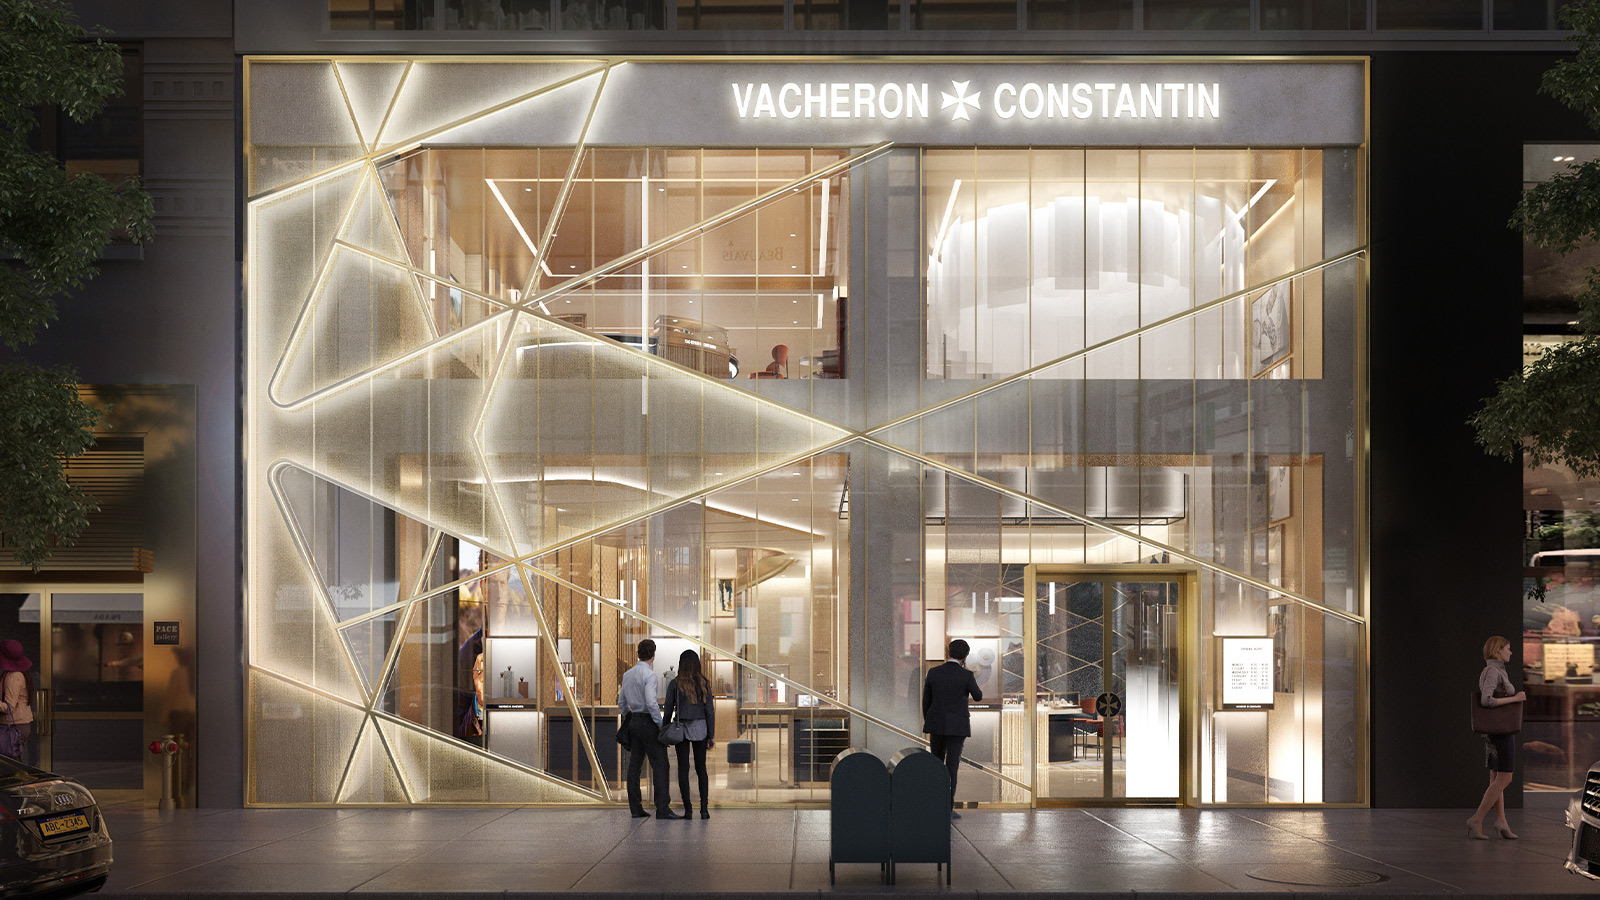 Vacheron Flagship Store in New York City